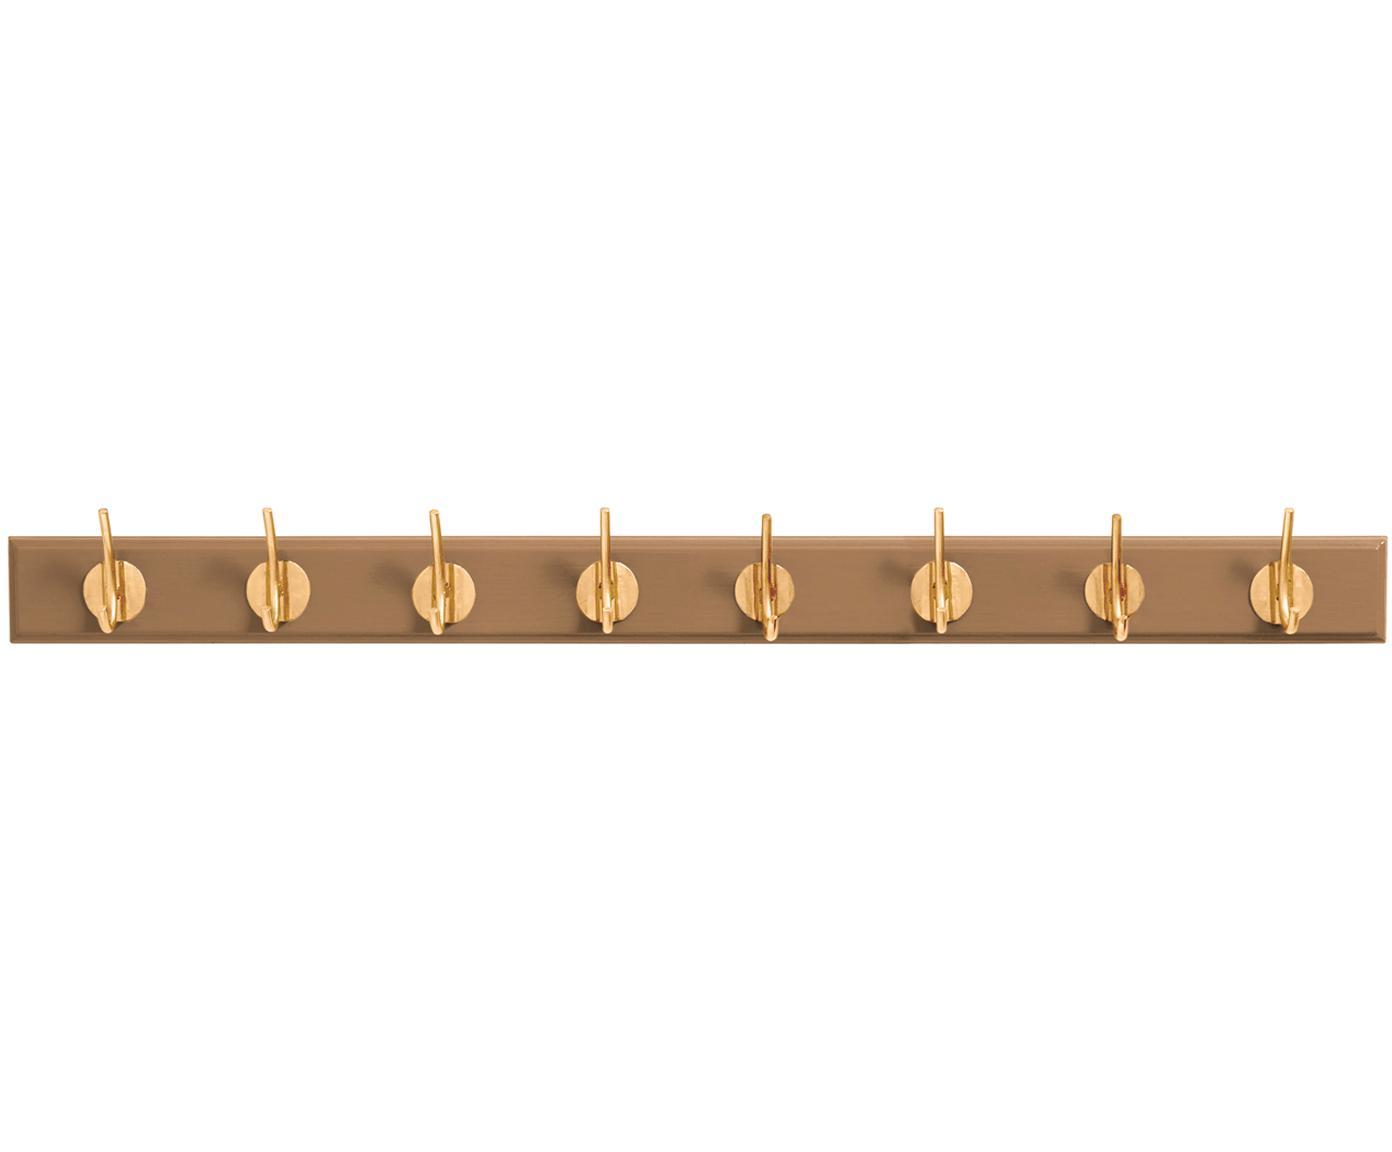 XL jassenhaak Aoife met metalen haak, Lijst: gelakt MDF, Kameelbruin, 90 x 7 cm